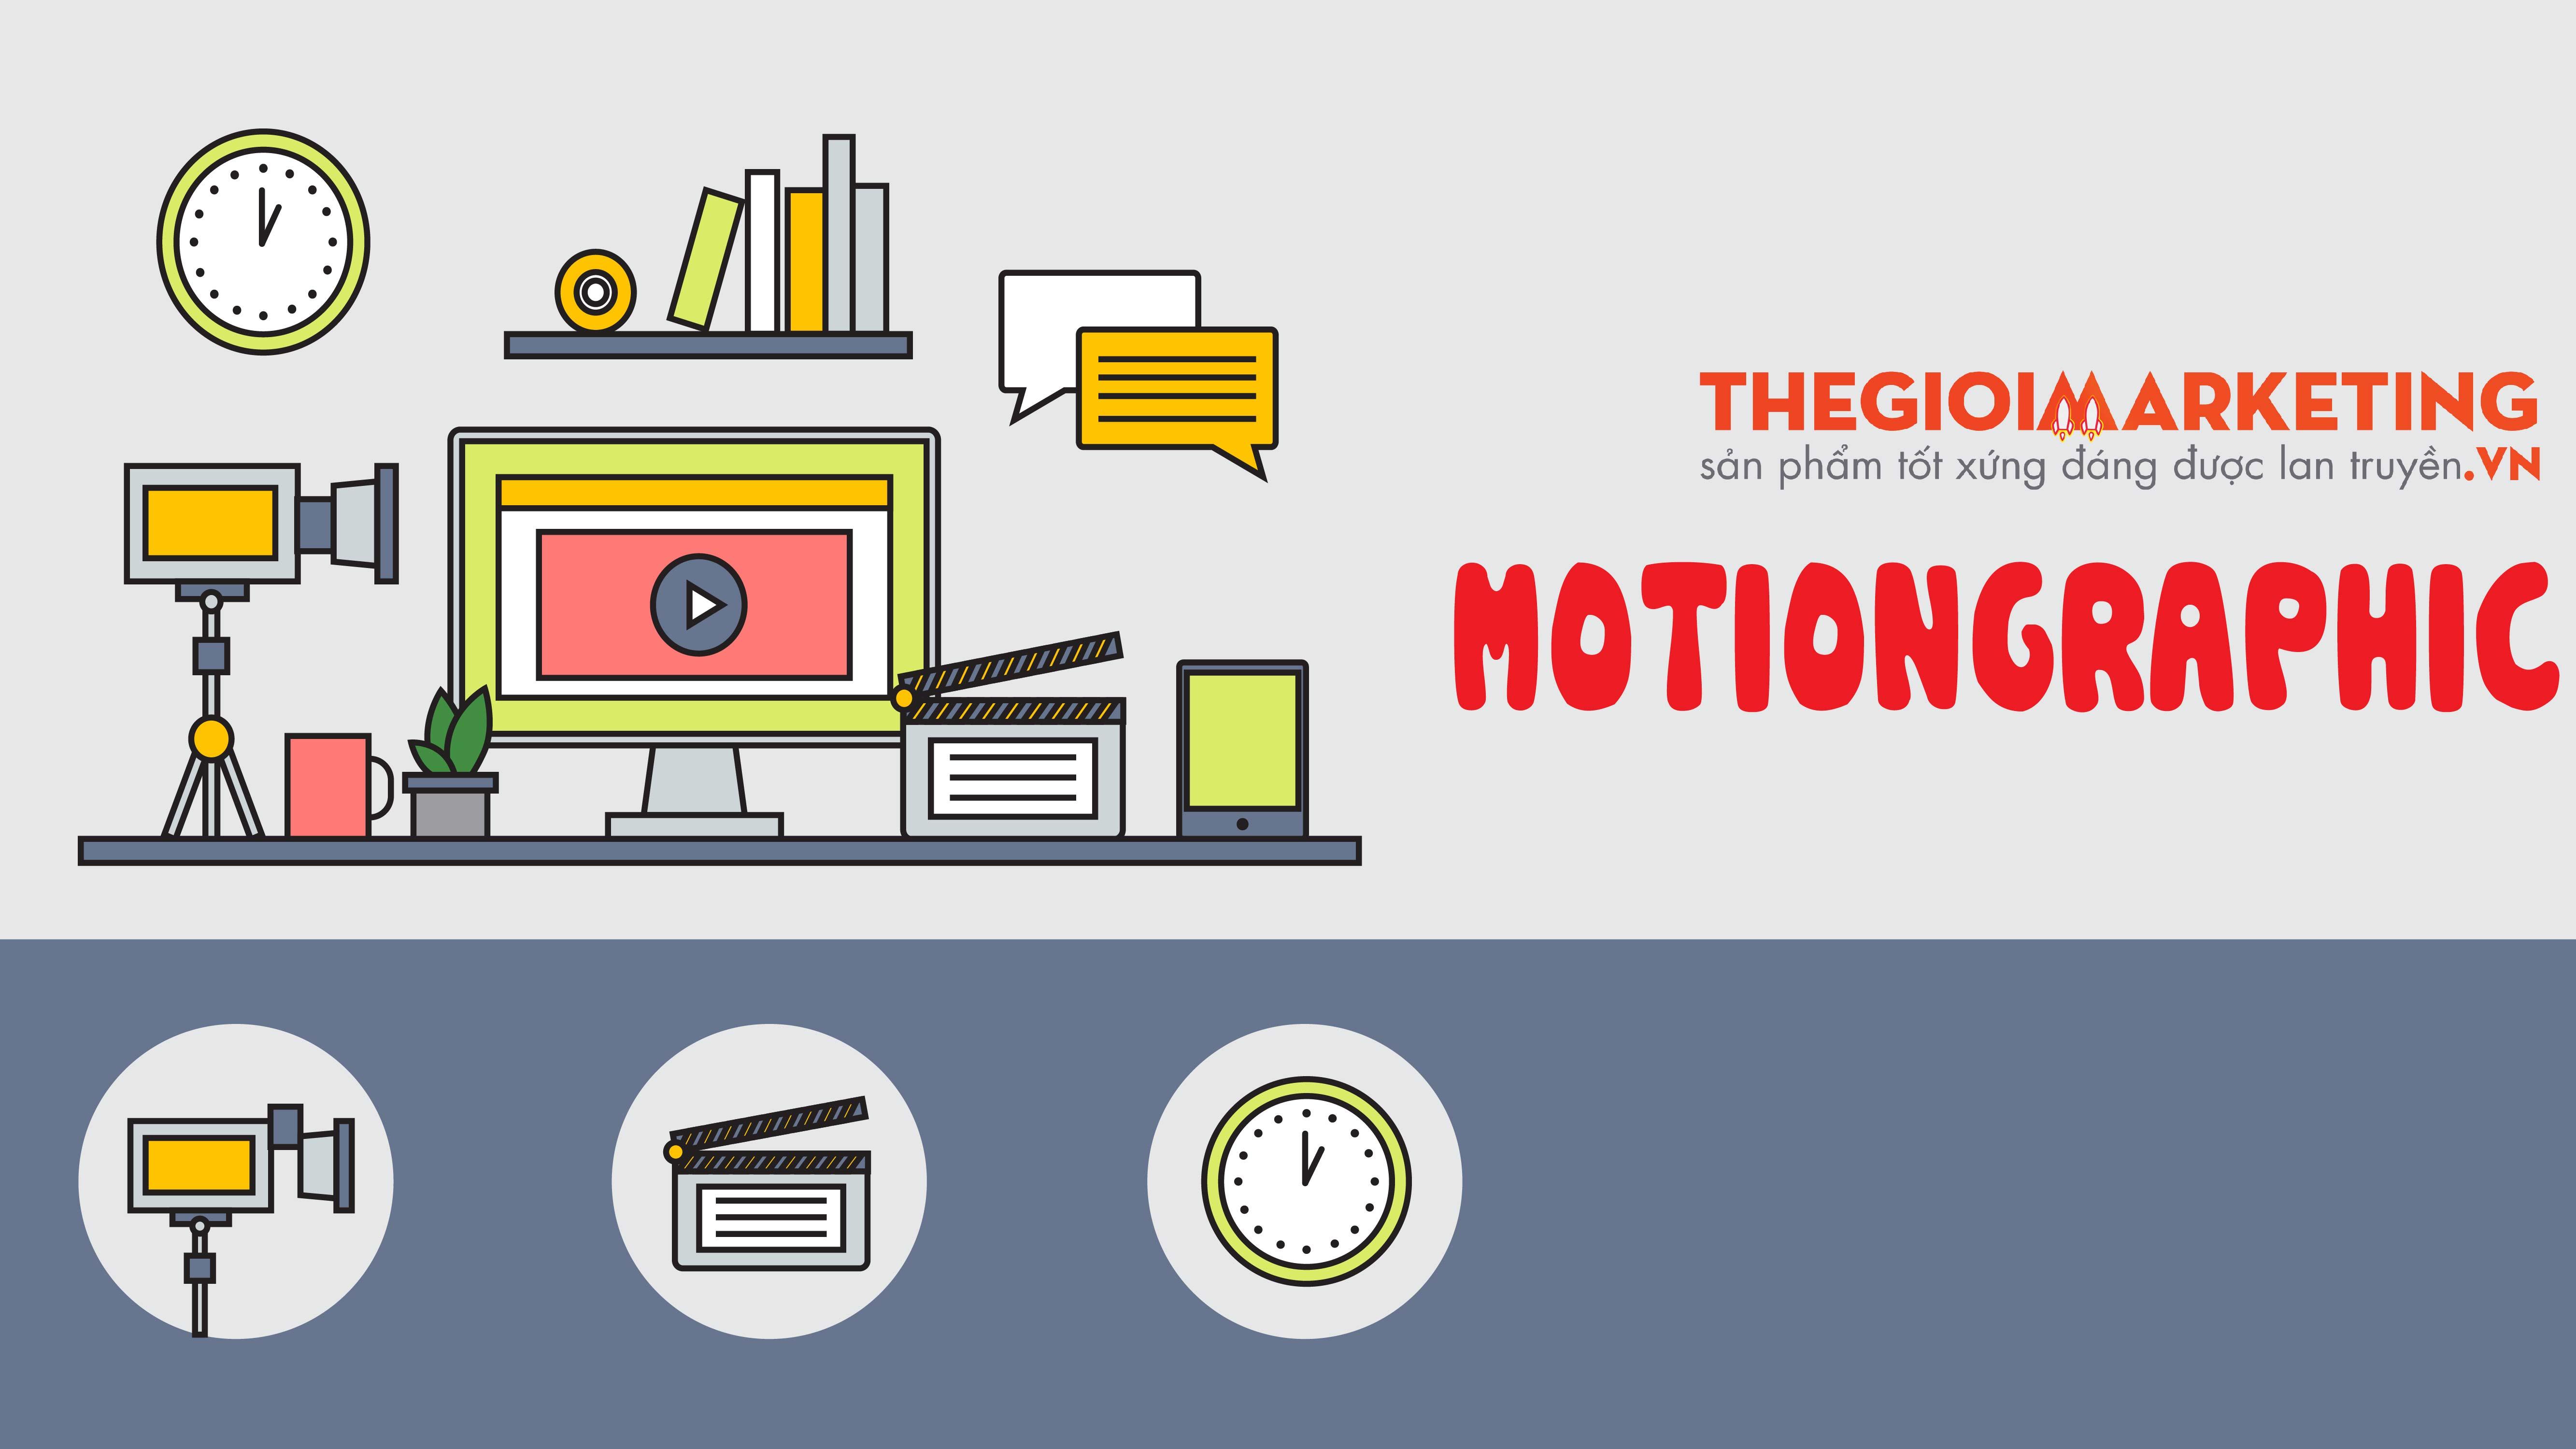 Motiongraphic 01